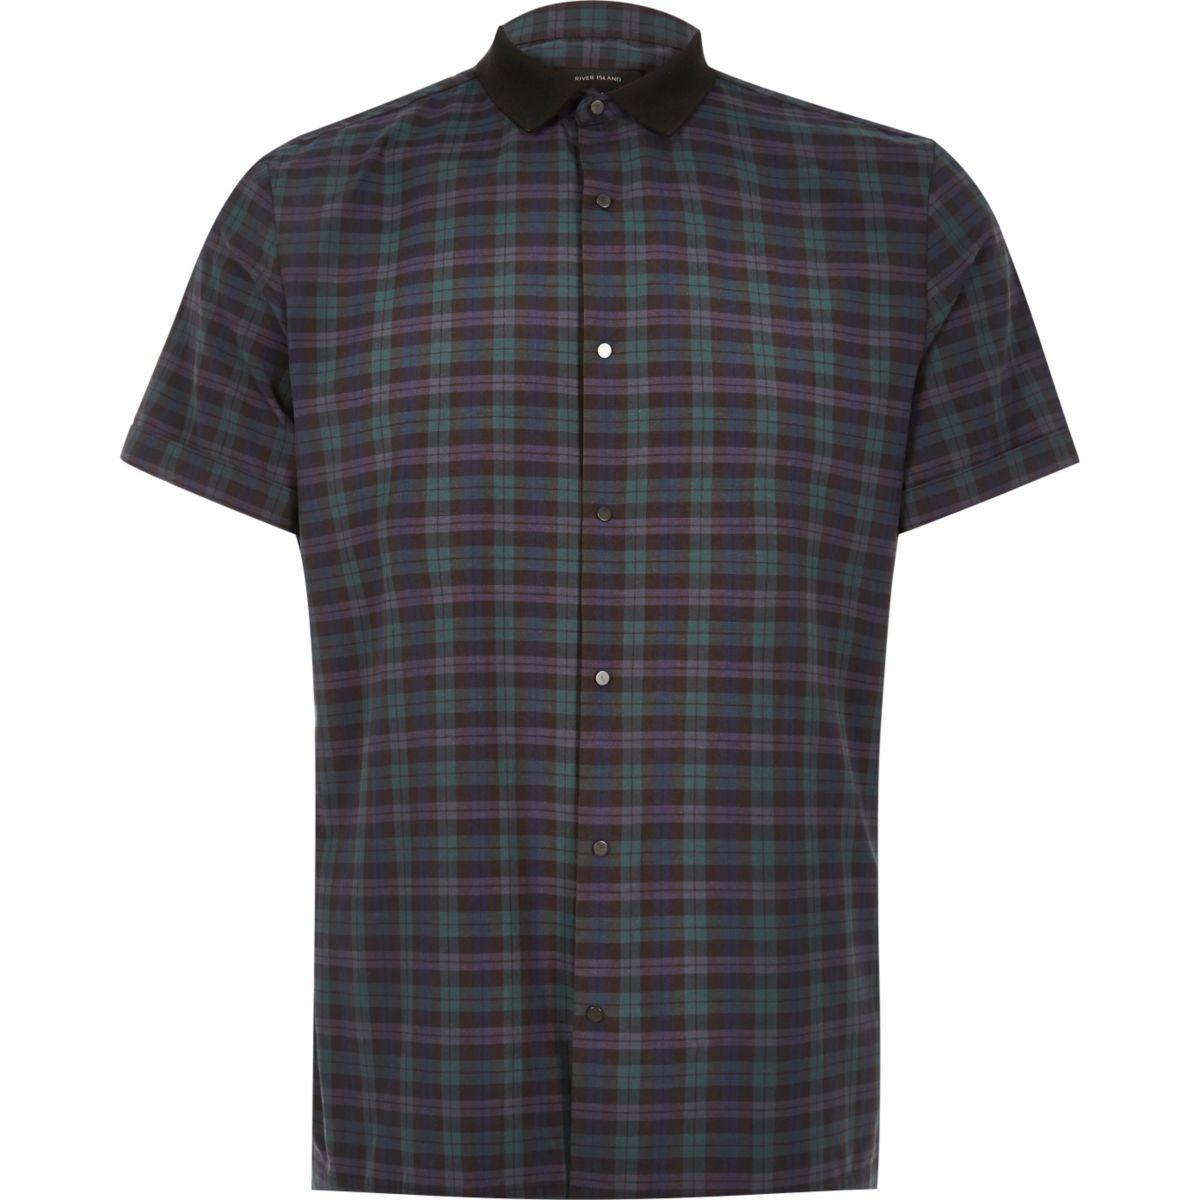 Green check contrast slim fit shirt